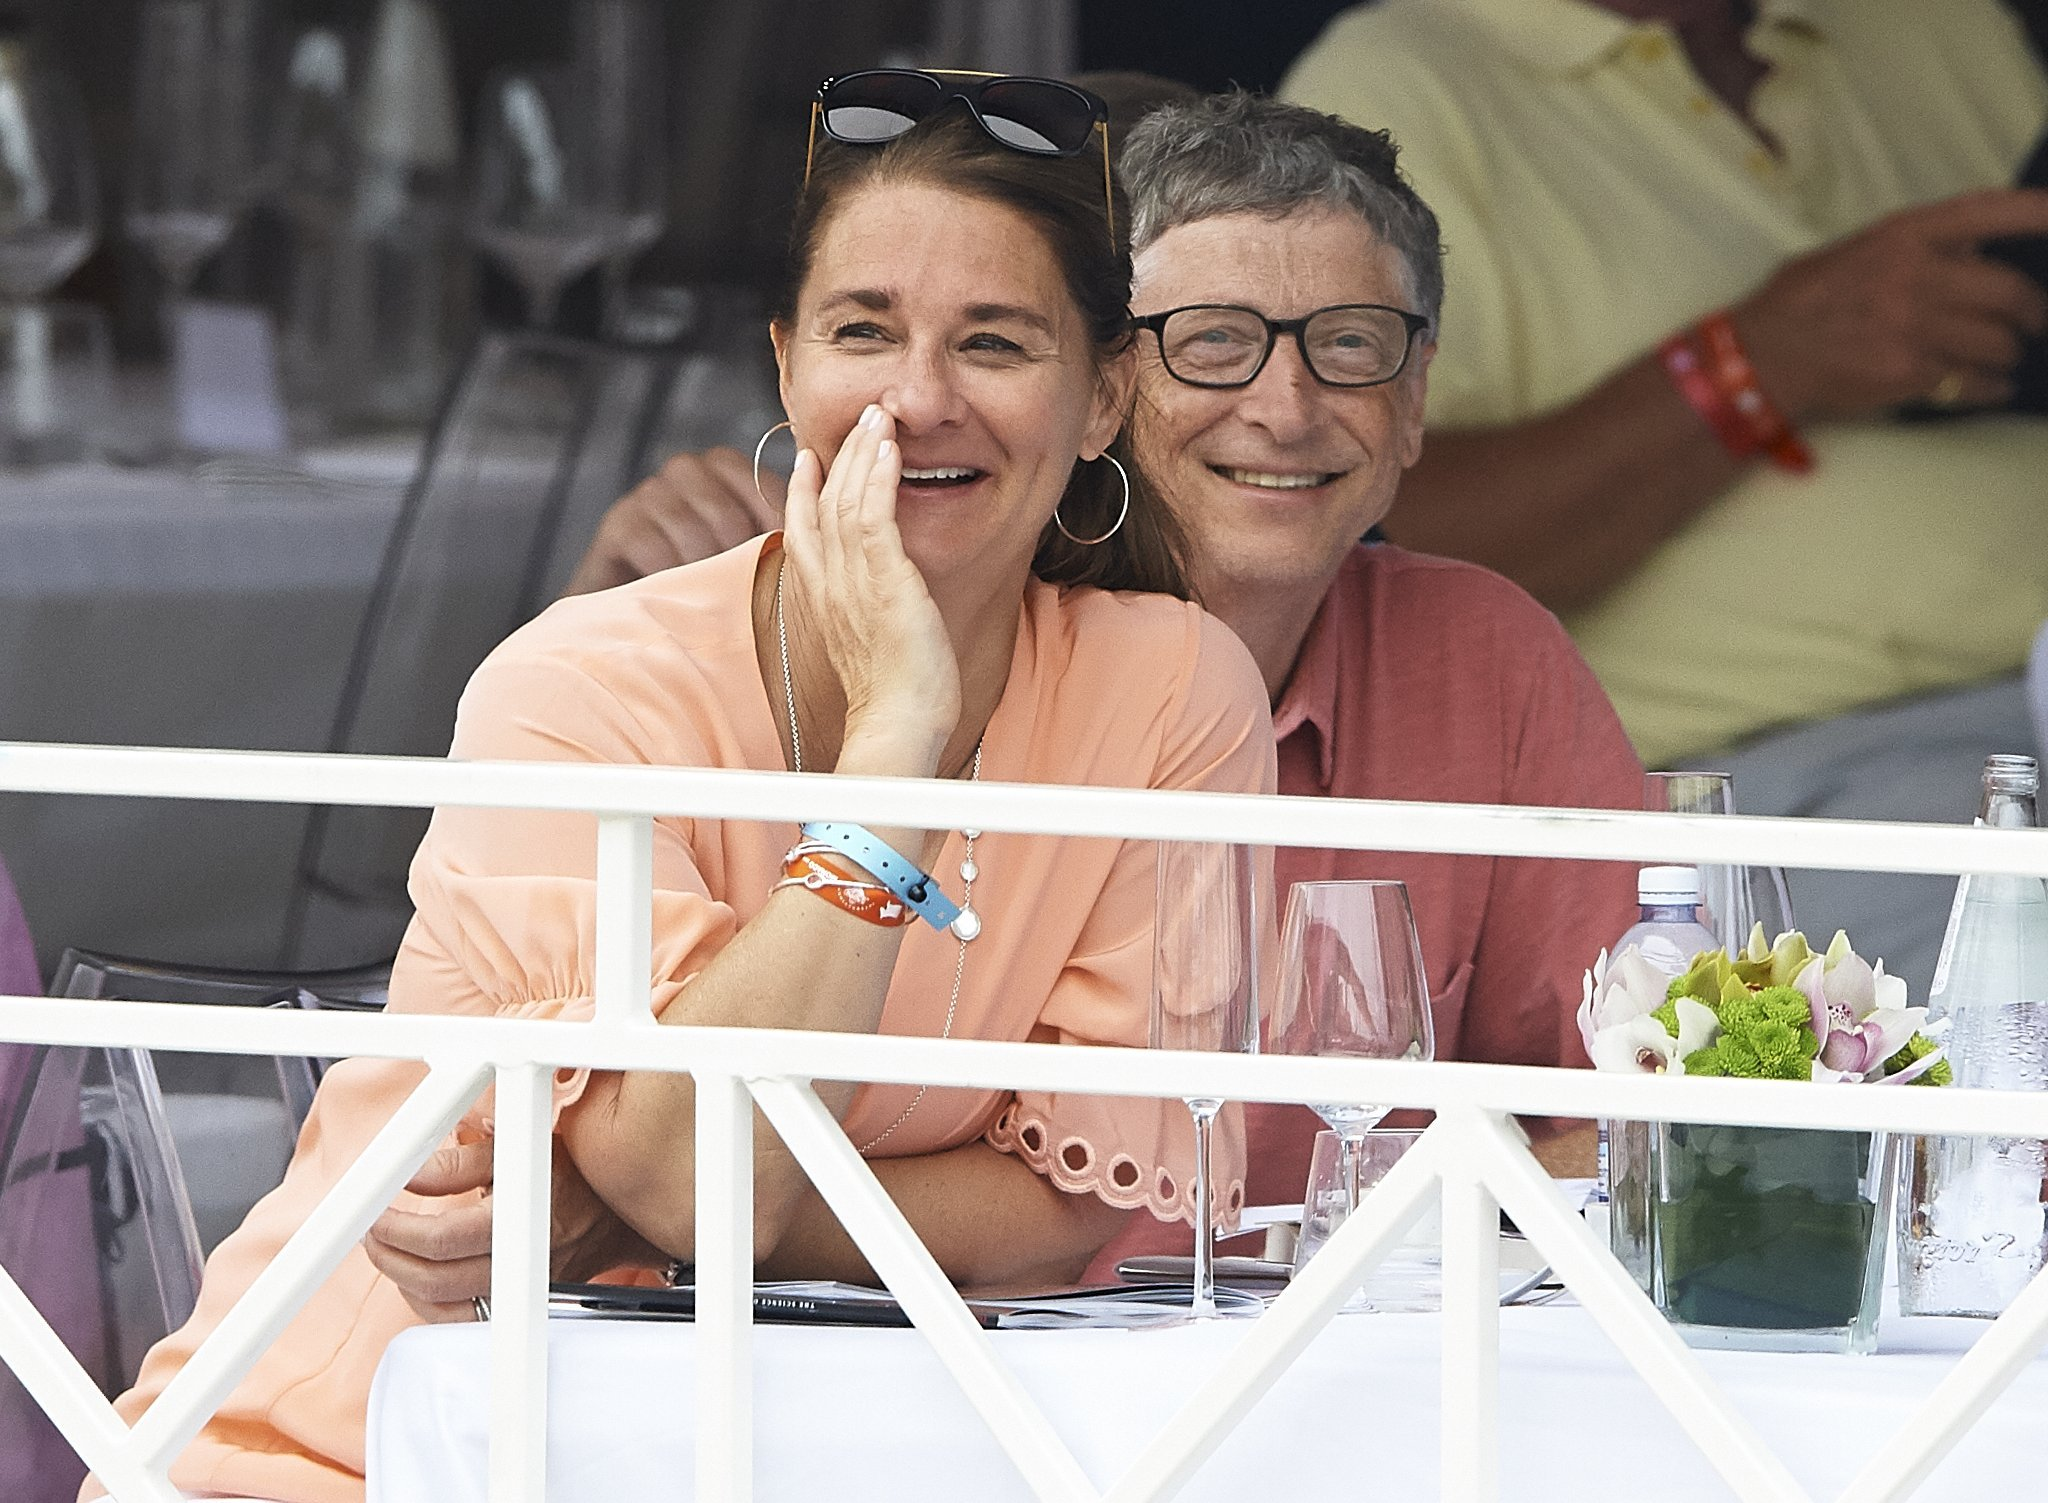 The ex-girlfriend Melinda Gates let Bill take annual getaways with